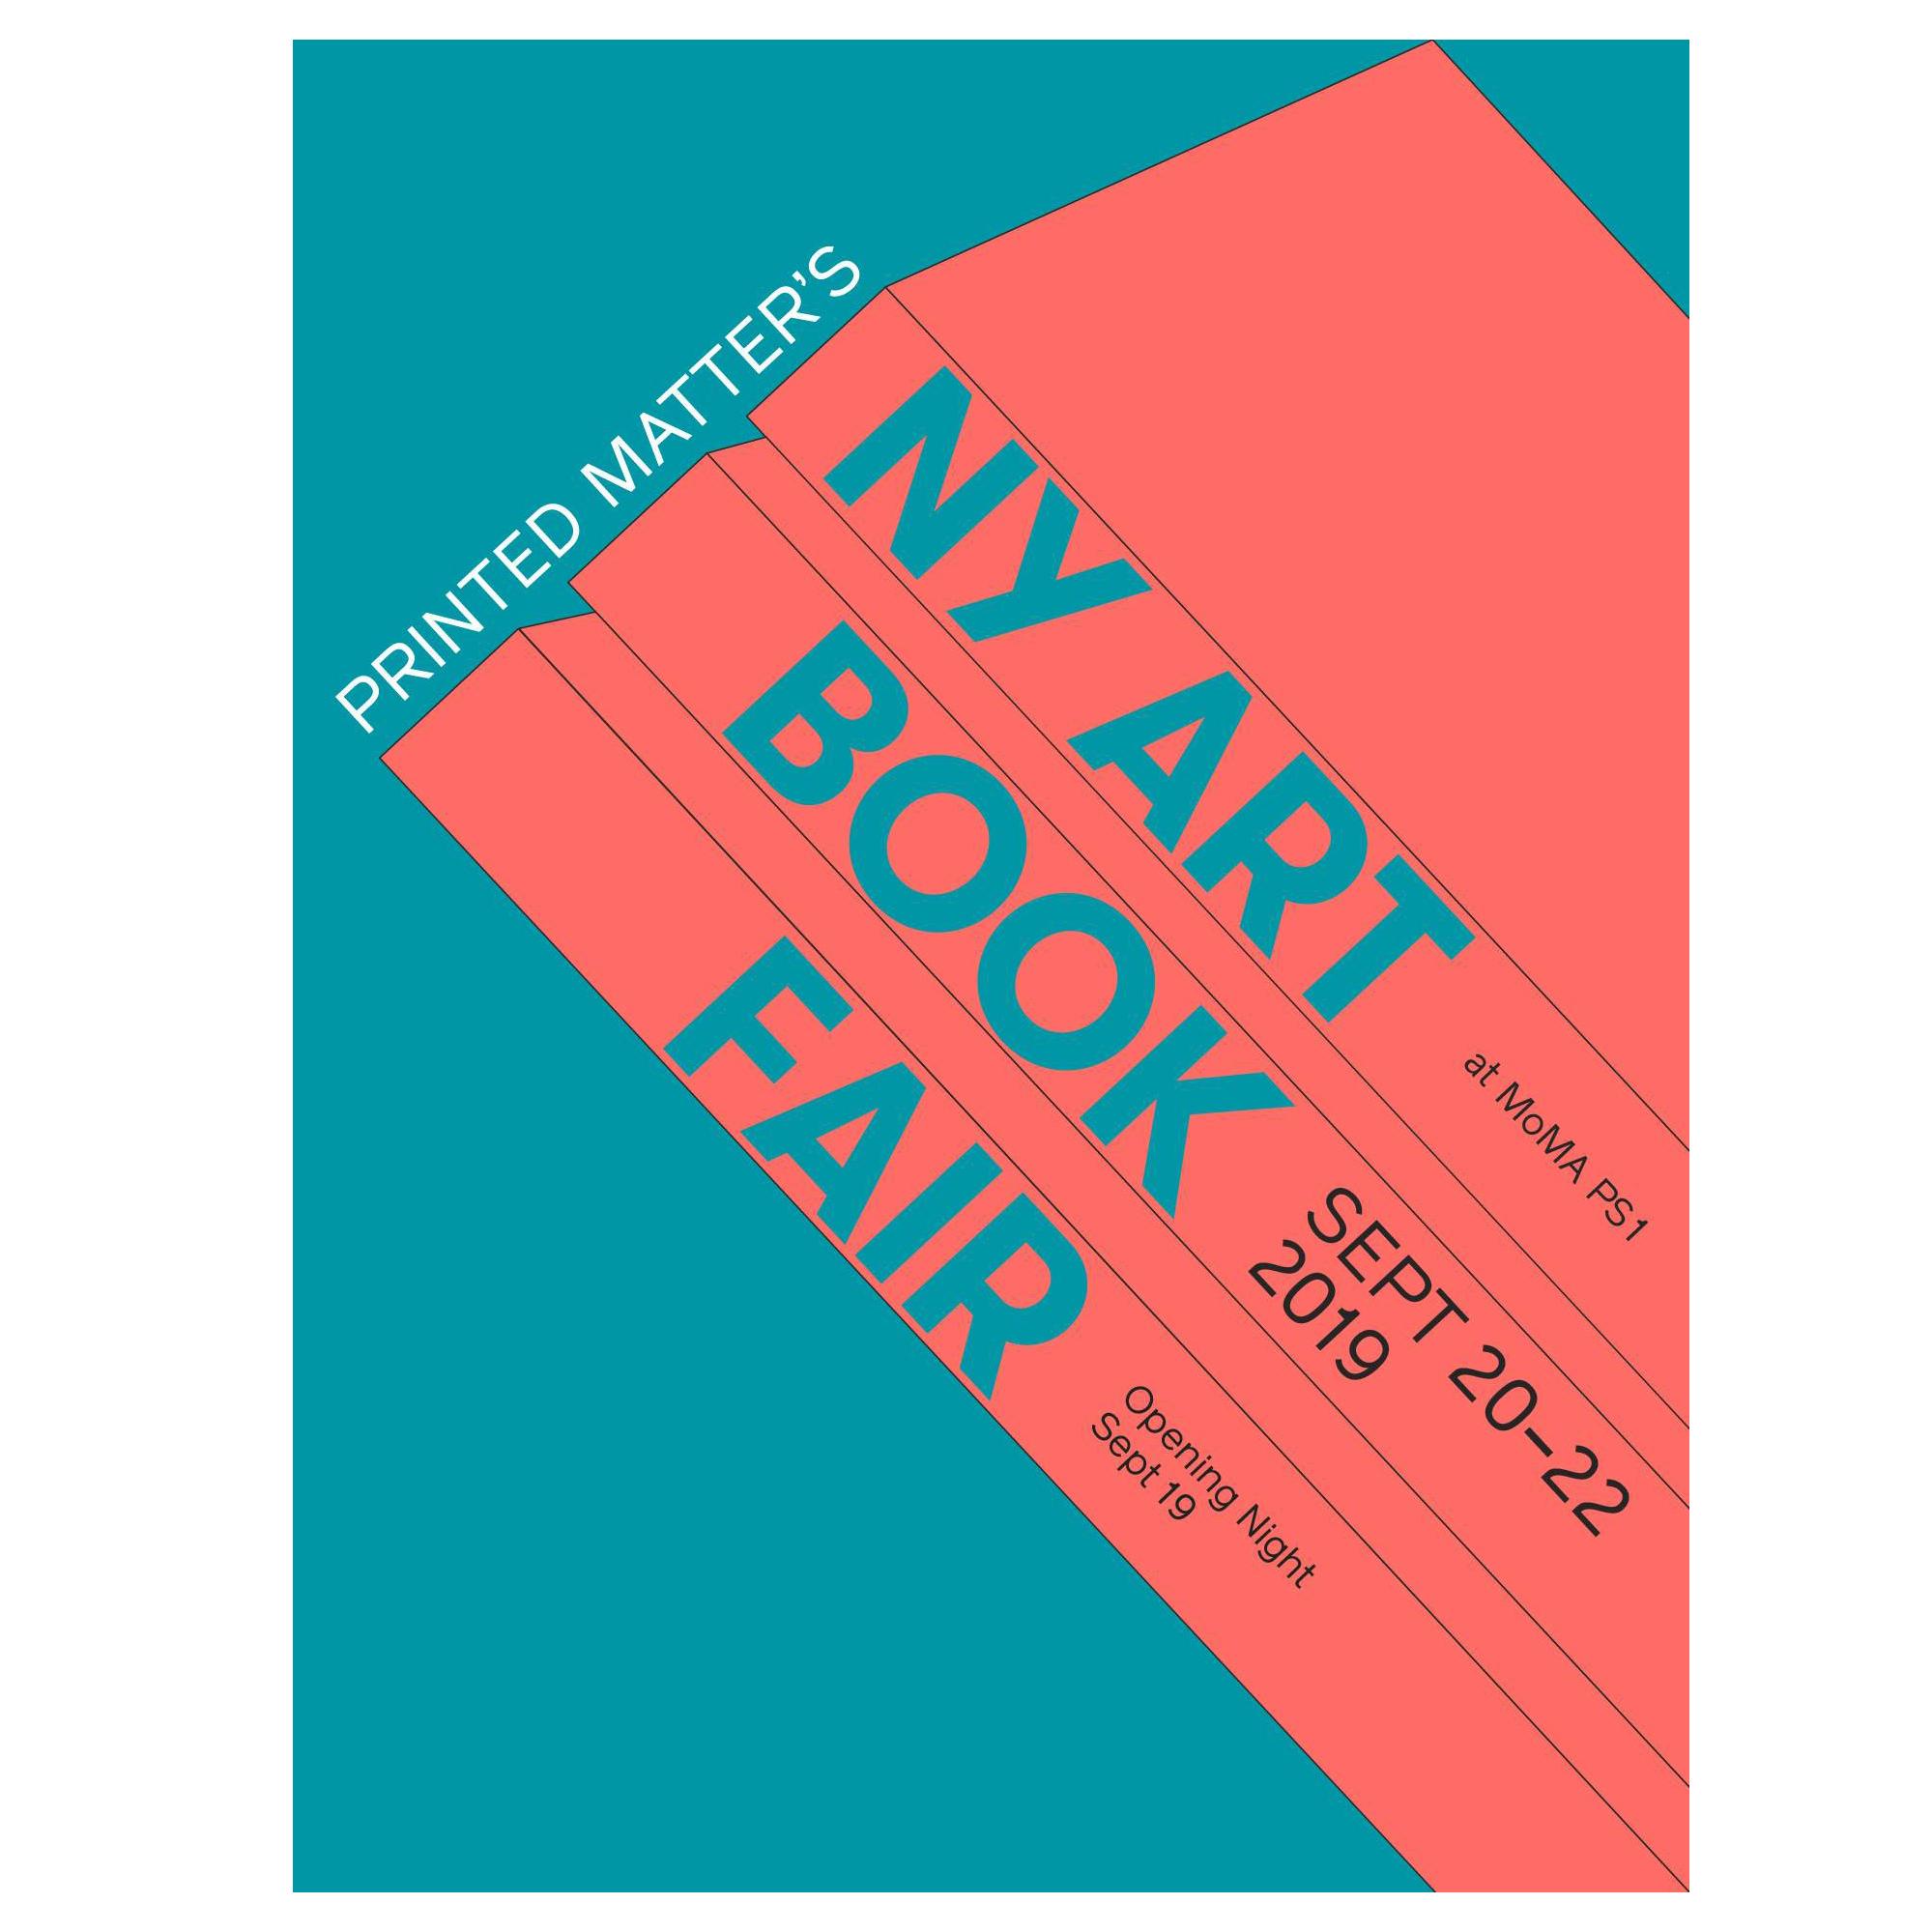 MoMA PS1, 22-25 Jackson Avenue, Long Island City, NY 11101  Booth A42 | Friday, 1-7pm | Saturday, 11-8pm | Sunday, 11-7pm